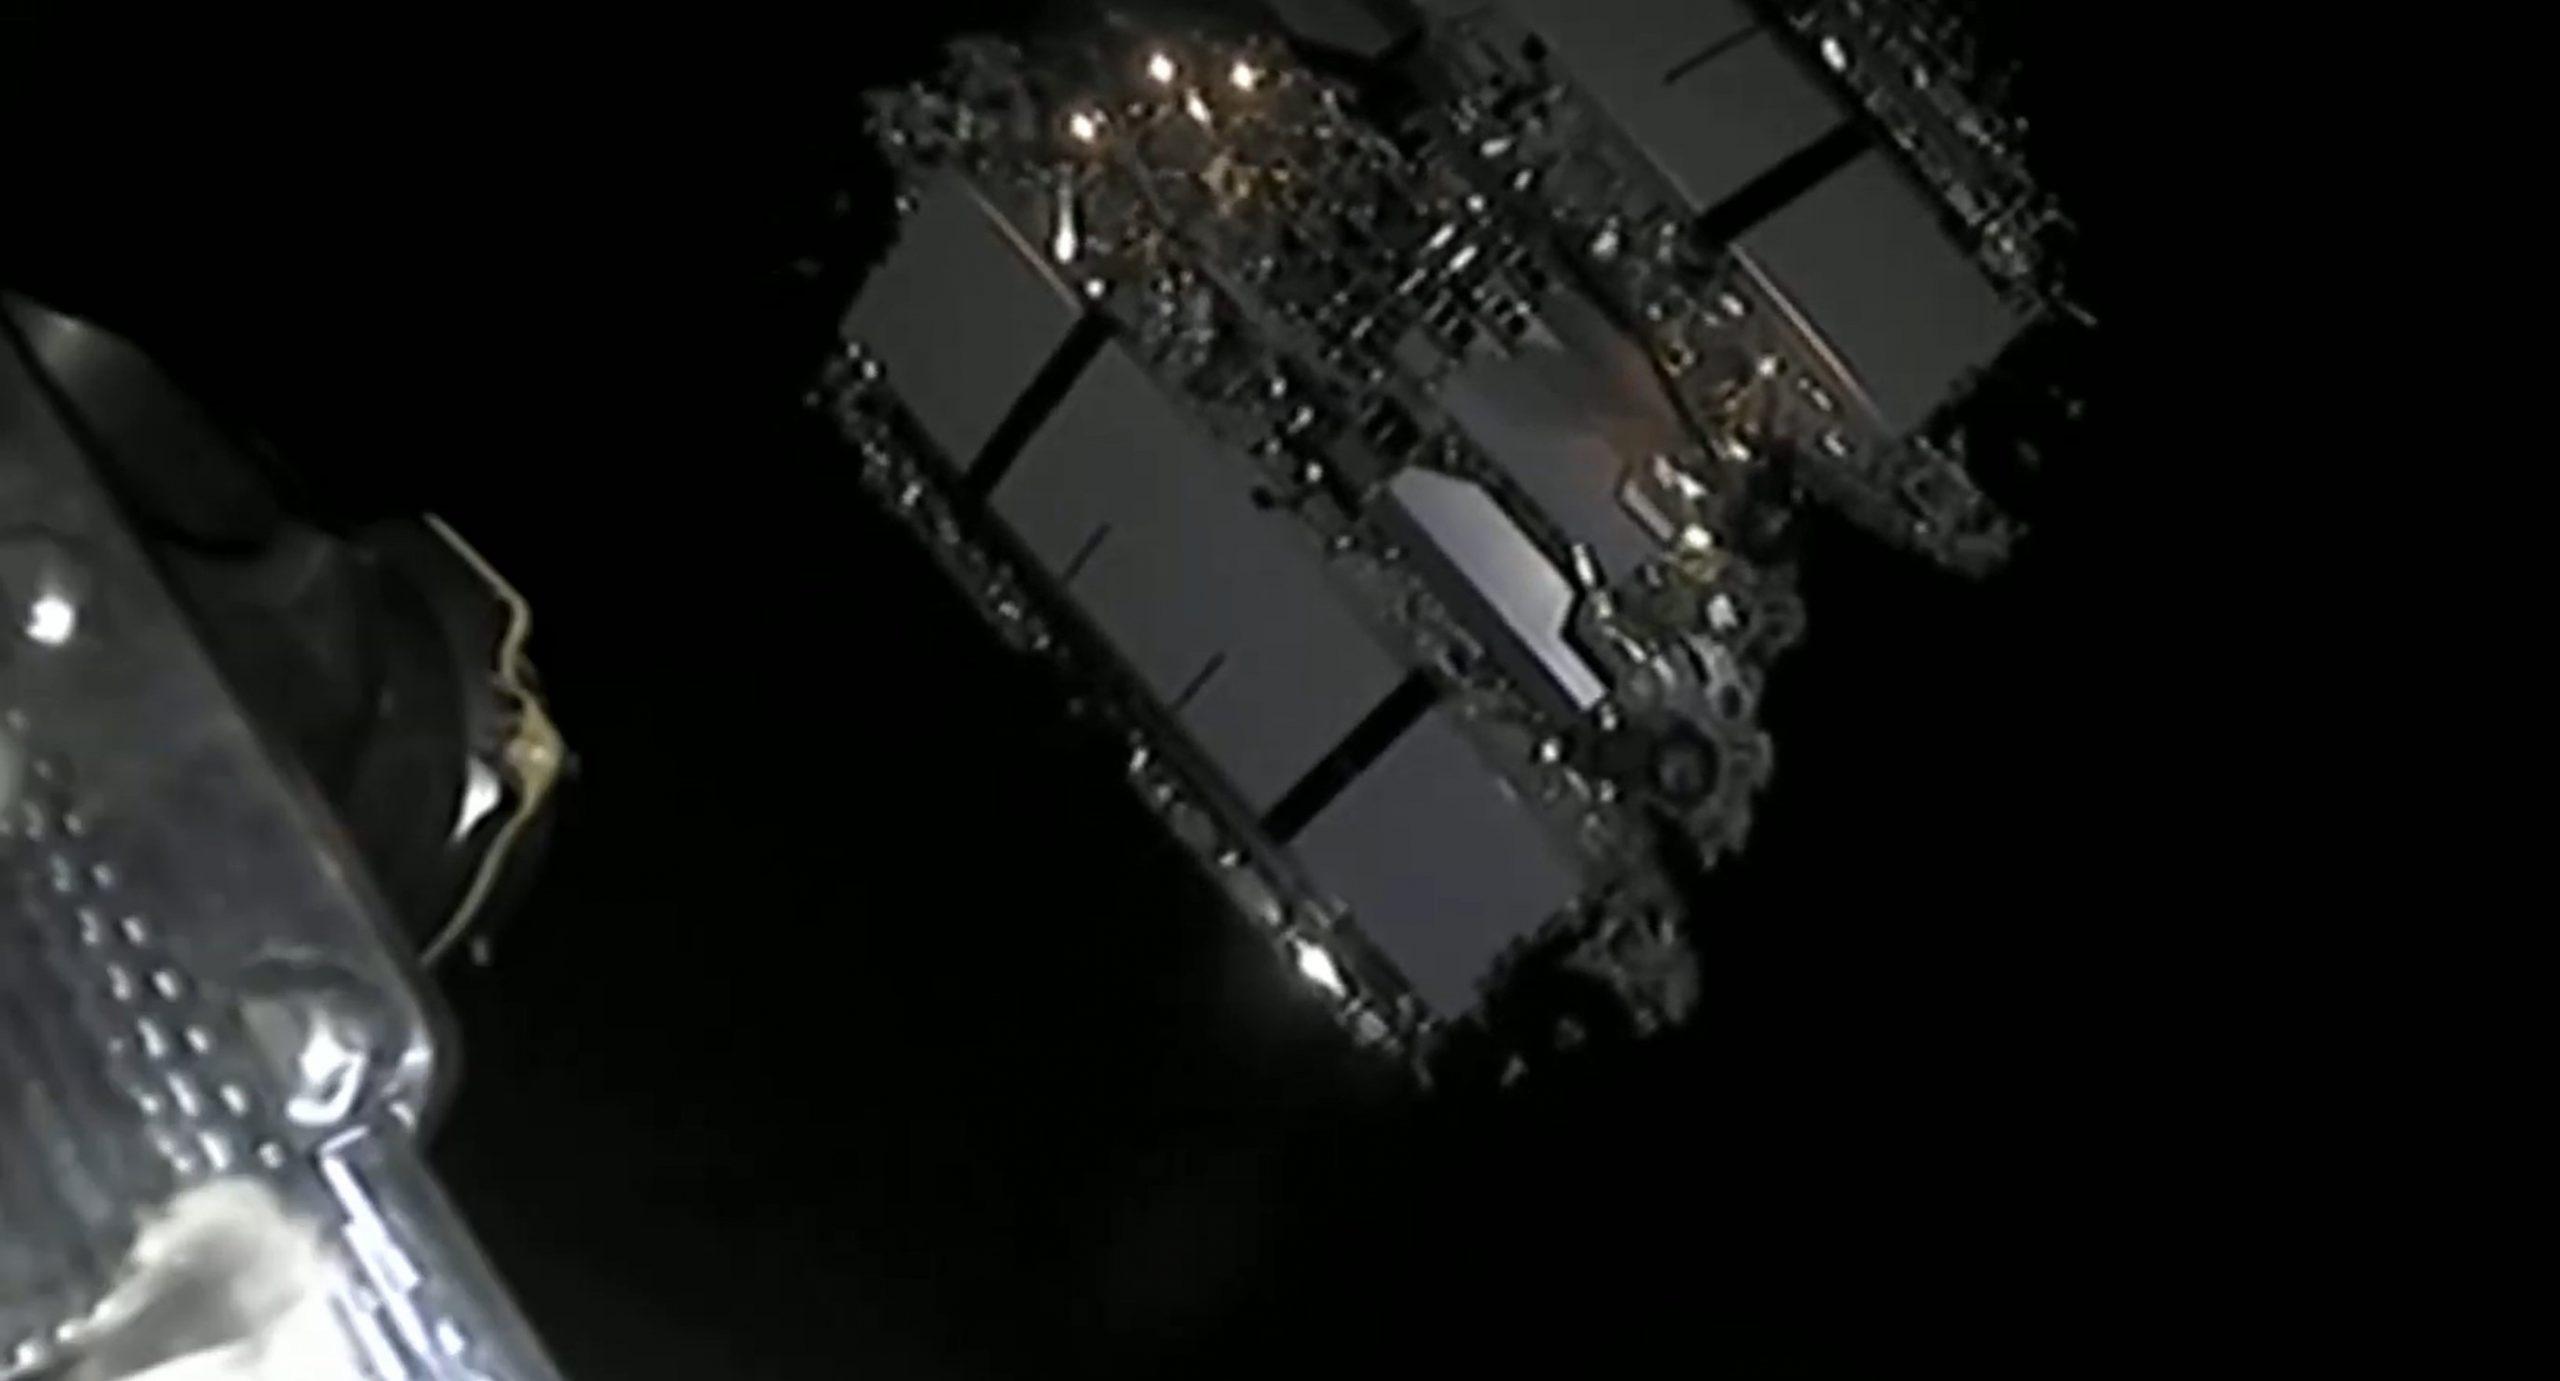 Starlink-9 BlackSky Falcon 9 B1051 080720 webcast (SpaceX) deploy 7